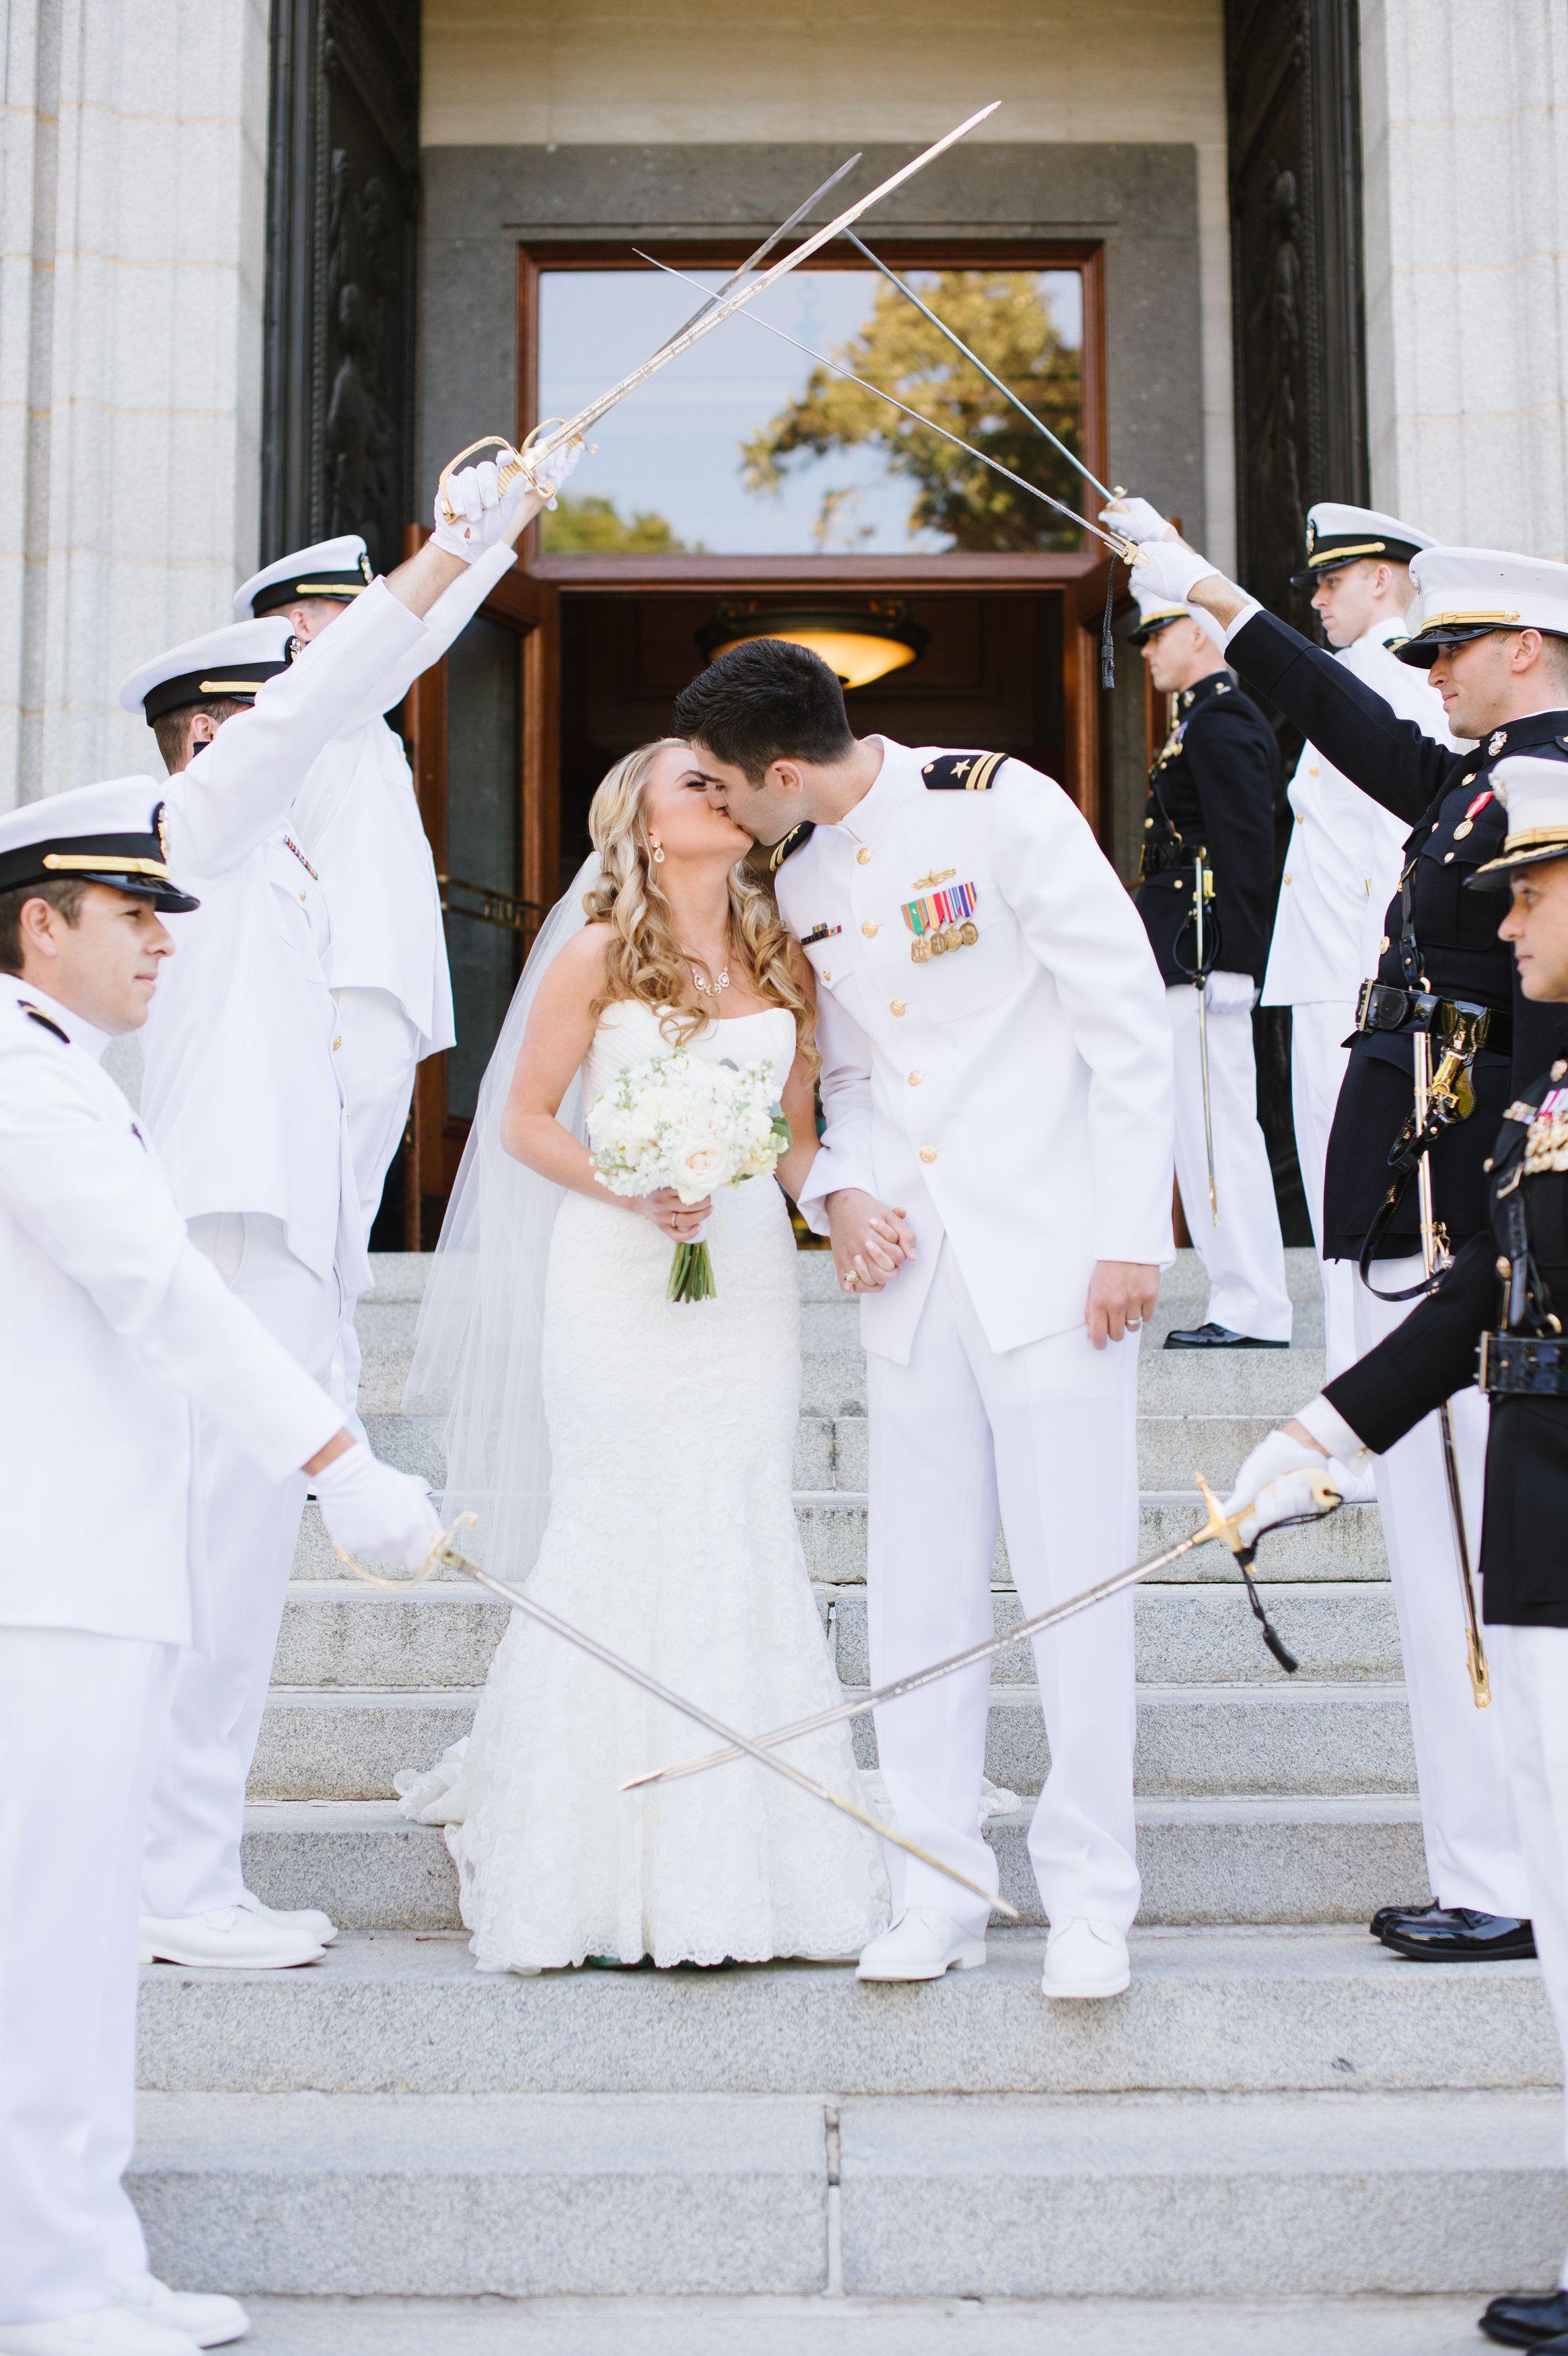 Military style wedding dresses